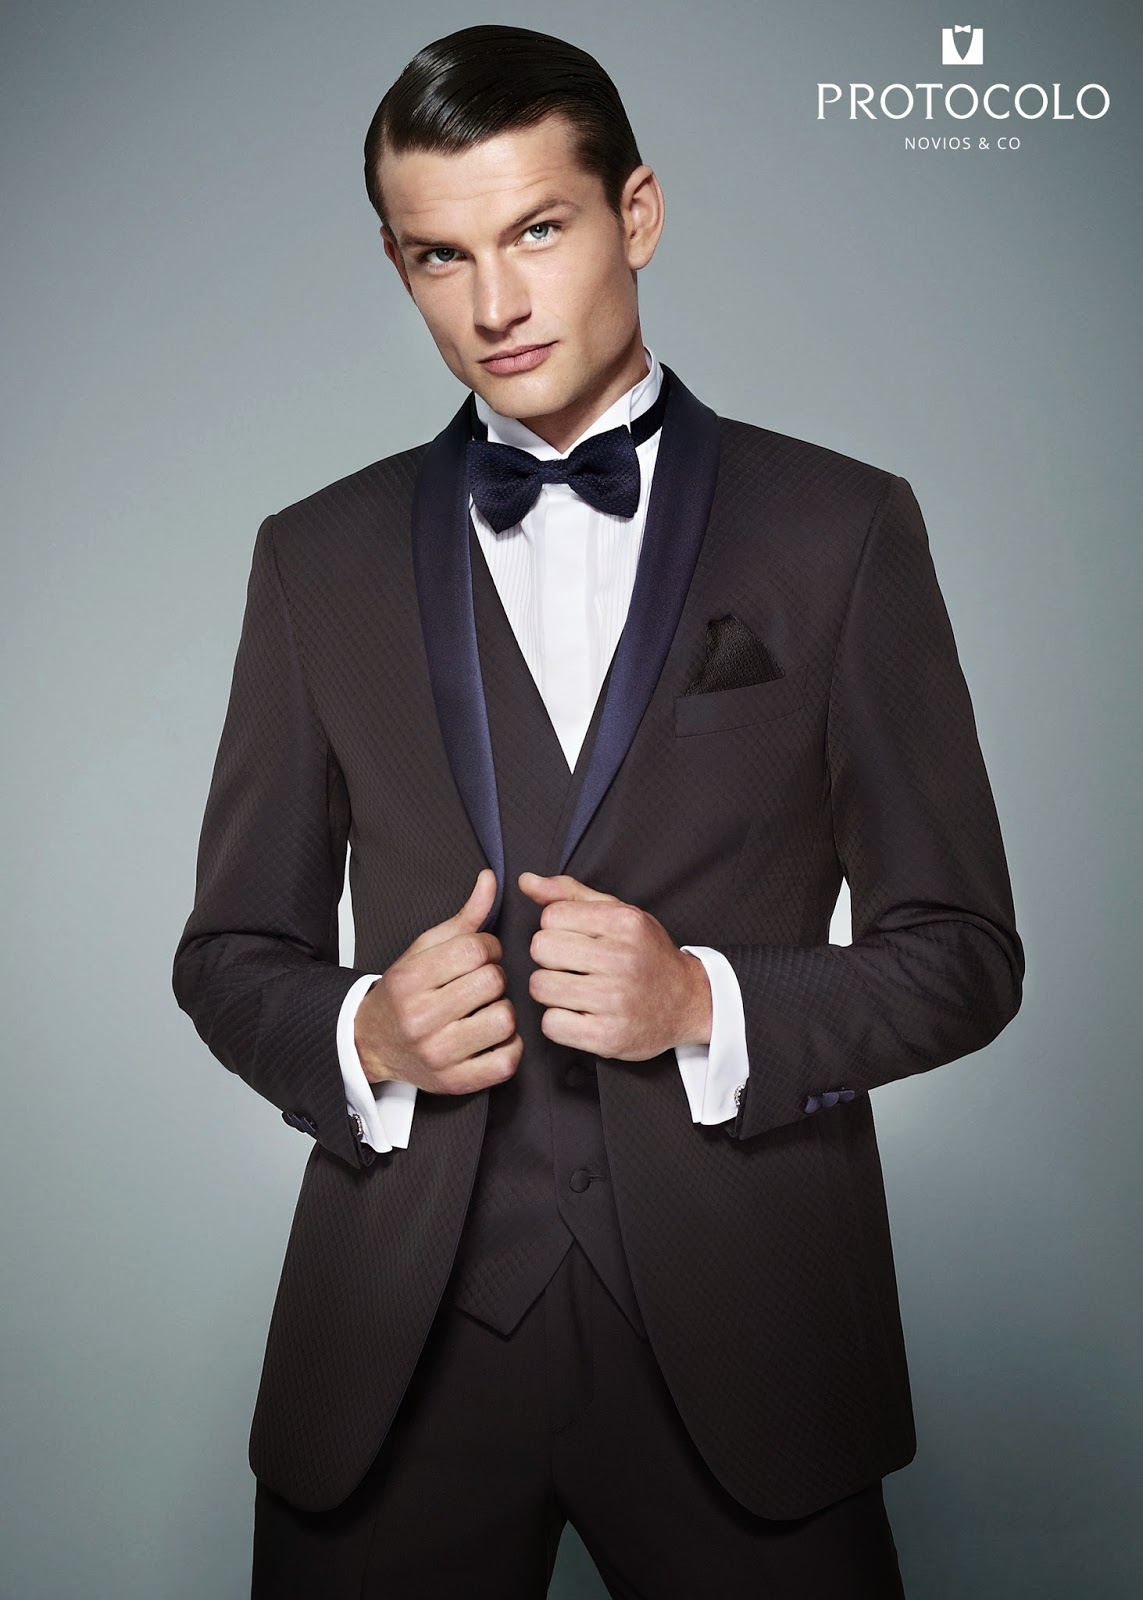 Protocolo novios guia tipos de traje de novio - smoking blog bodas mi boda gratis